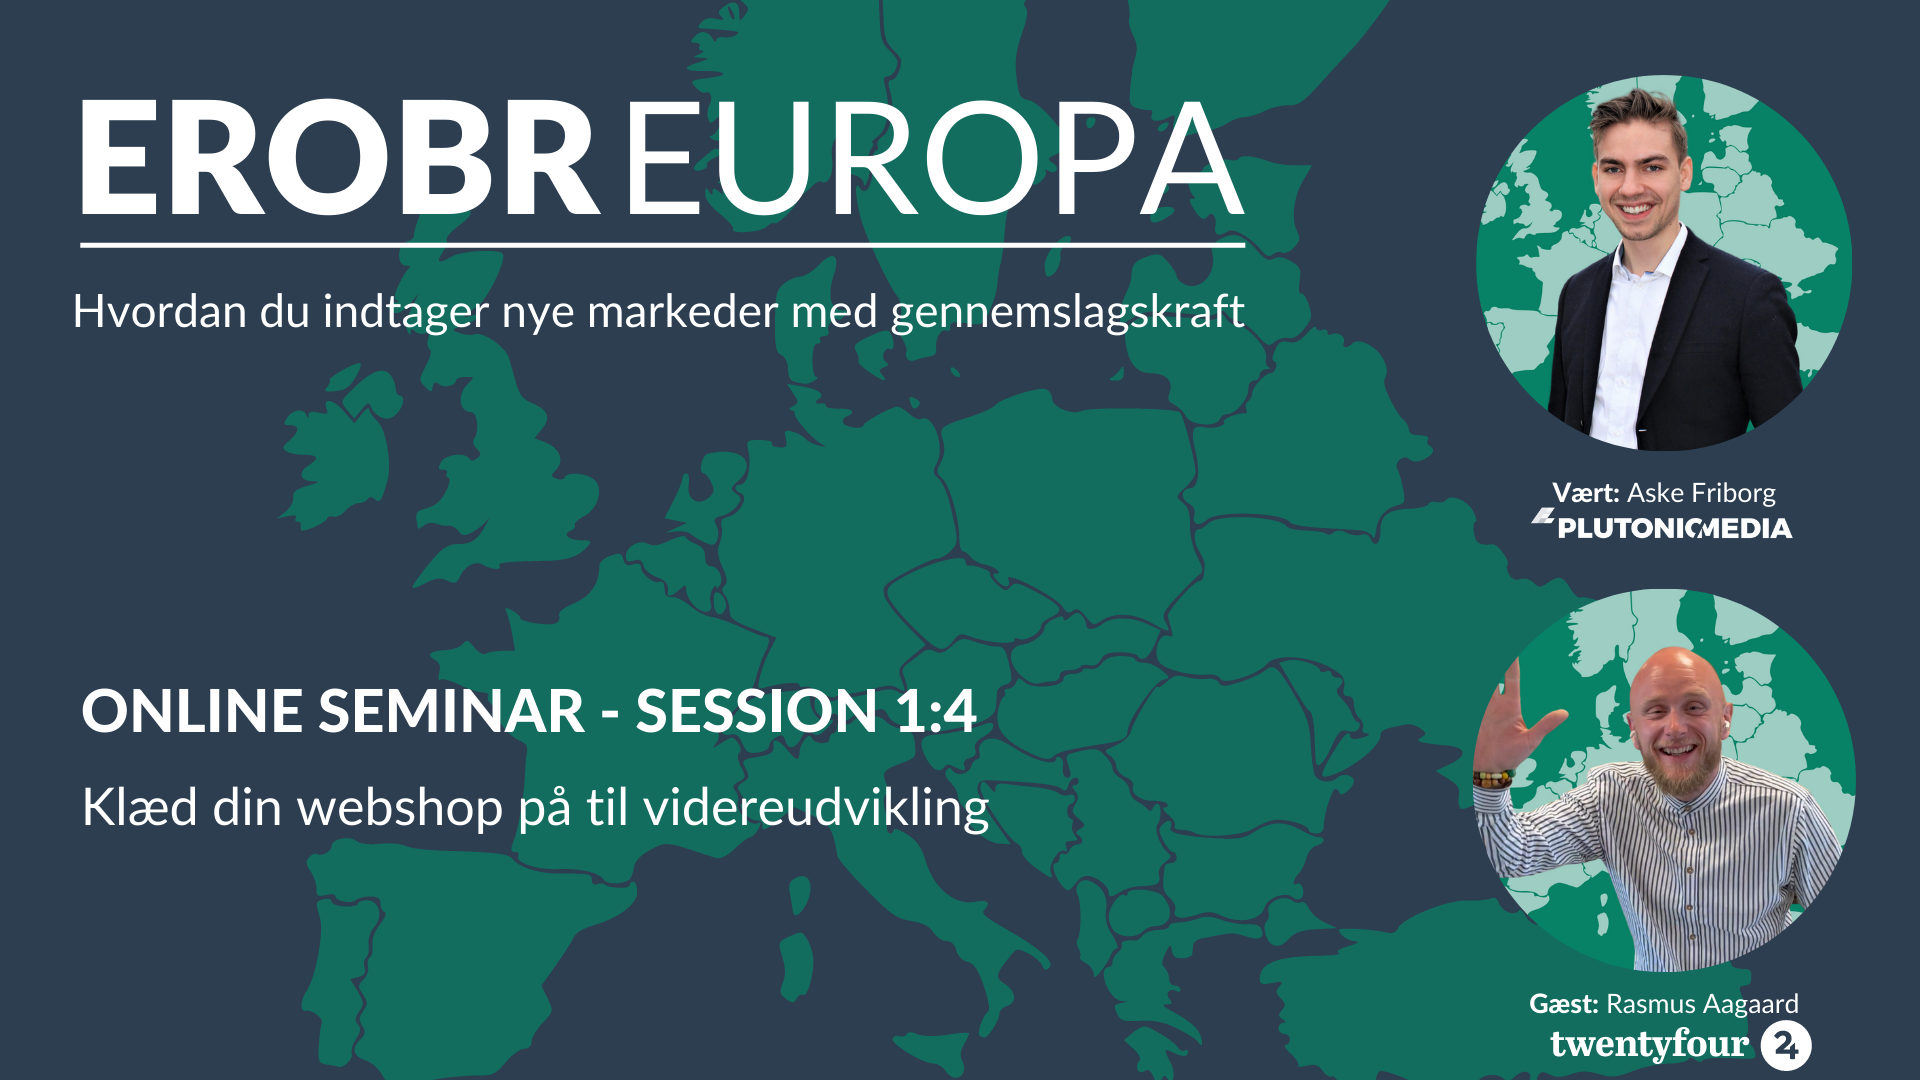 EROBR EUROPA session 1 af 4 - Twentyfour x Plutonic Media